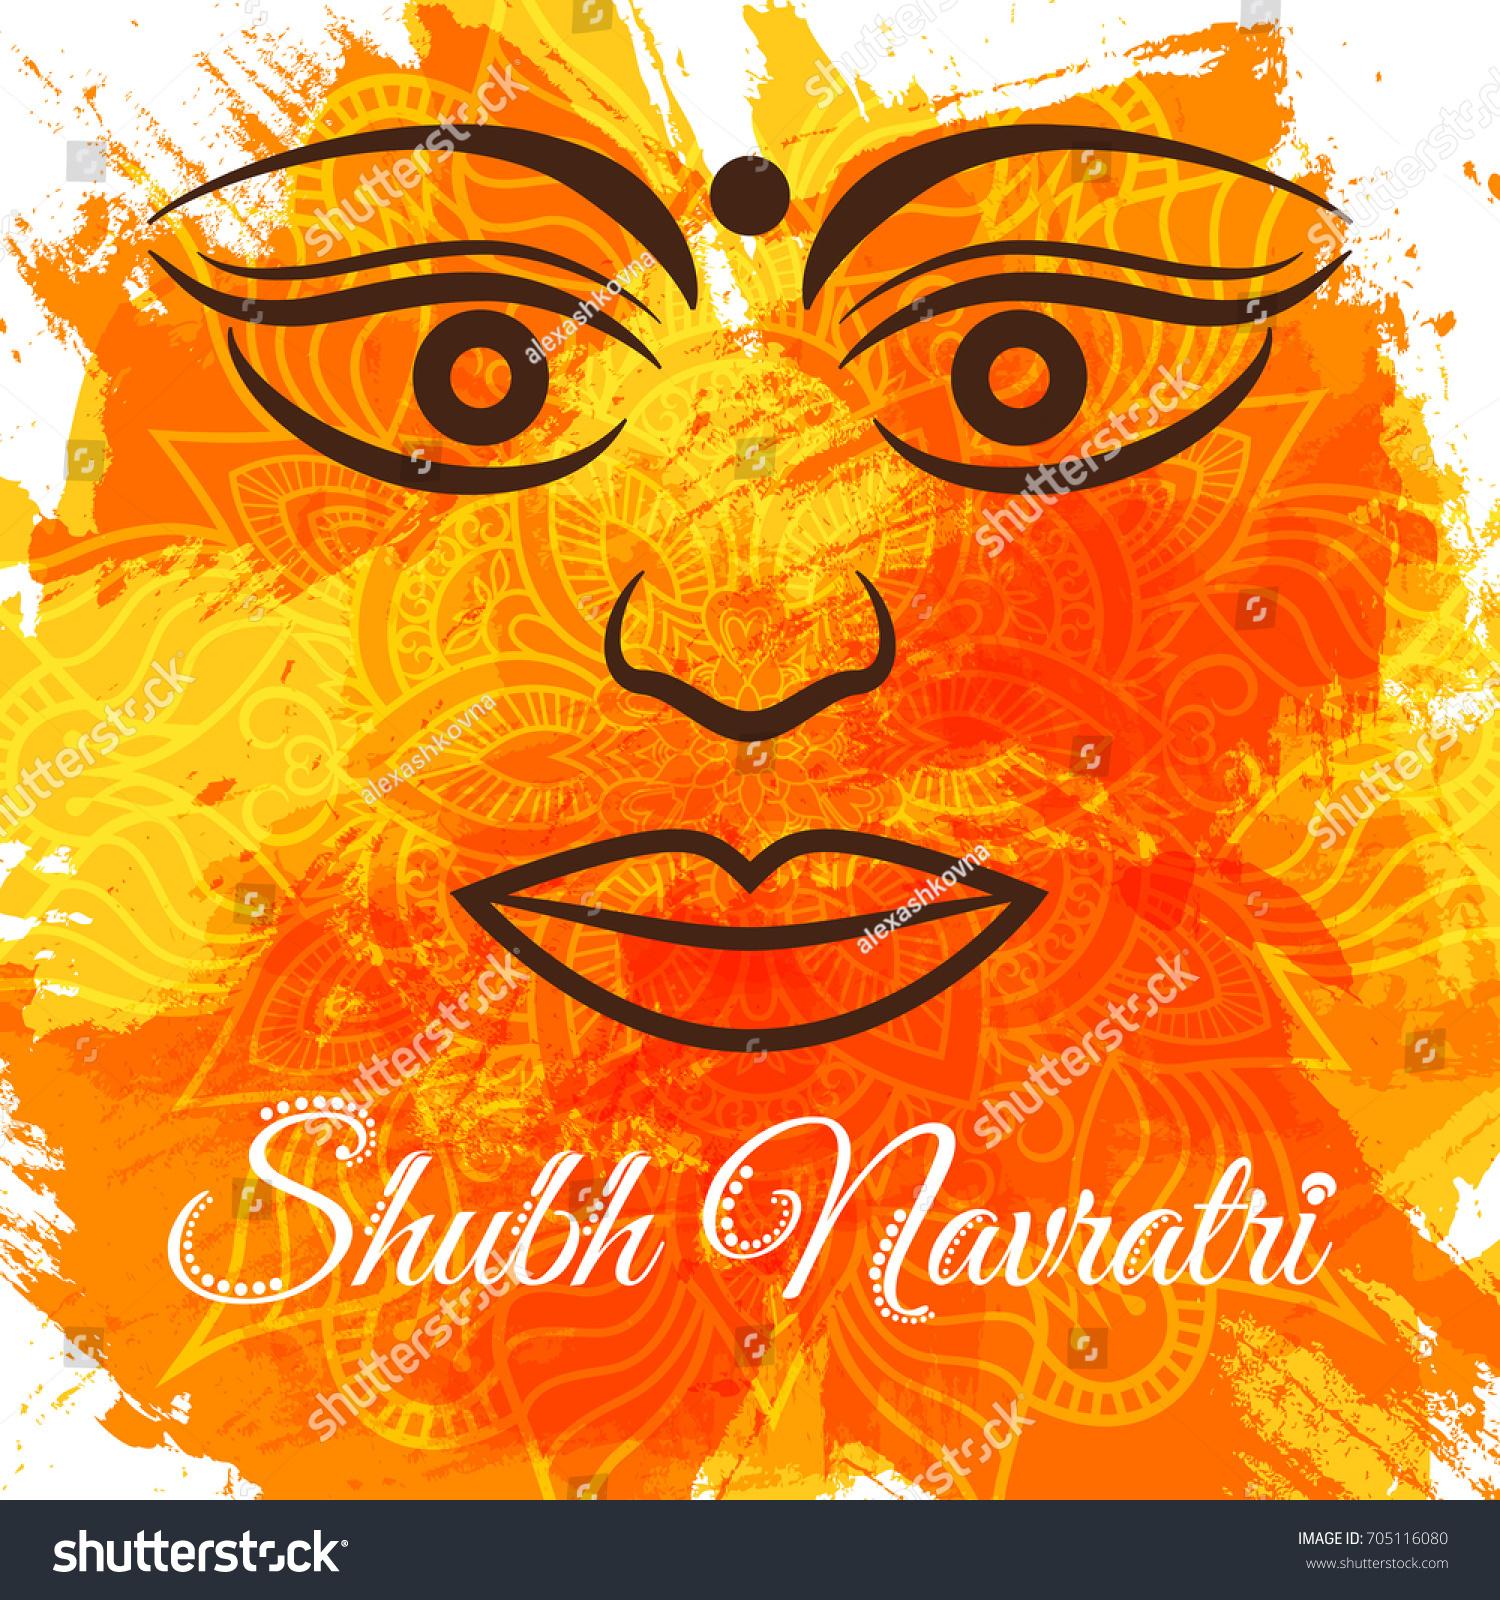 Shubh Navratri Durga Puja Greeting Poster Stock Vector Royalty Free